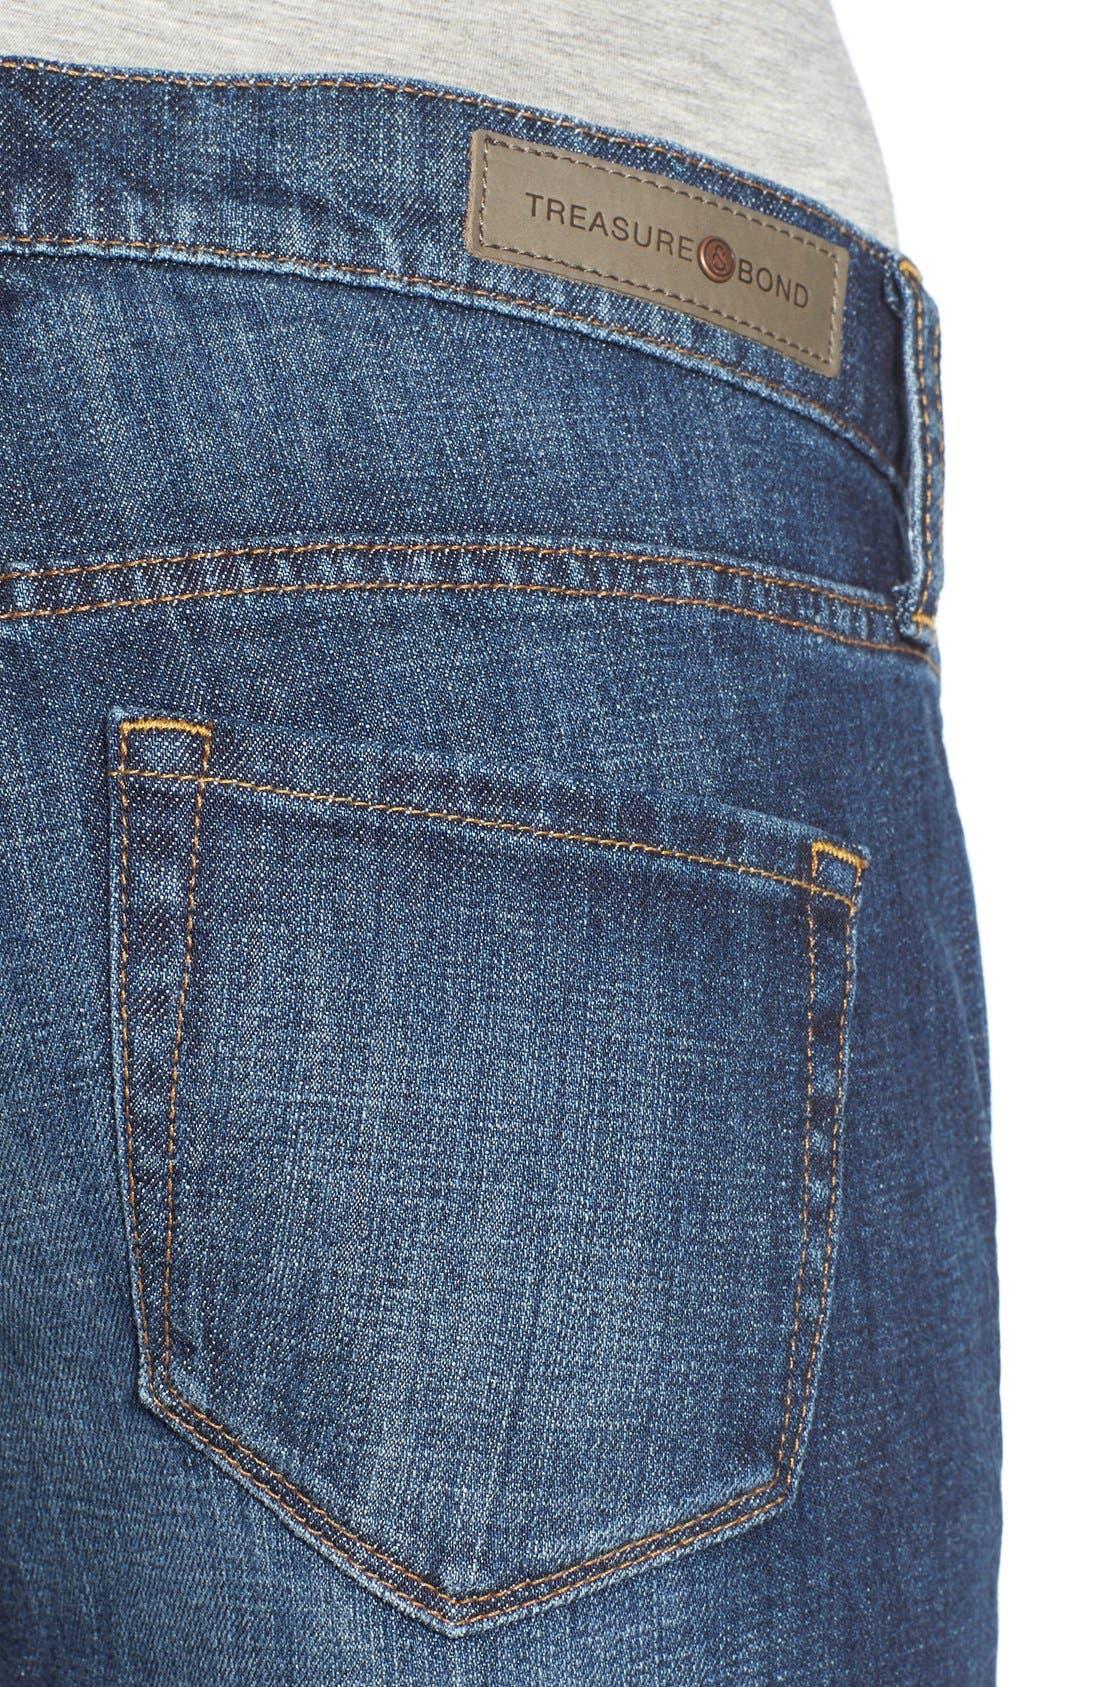 Treasure&Bond Ankle Boyfriend Skinny Jeans,                             Alternate thumbnail 5, color,                             Bluejay Dusk Destroy